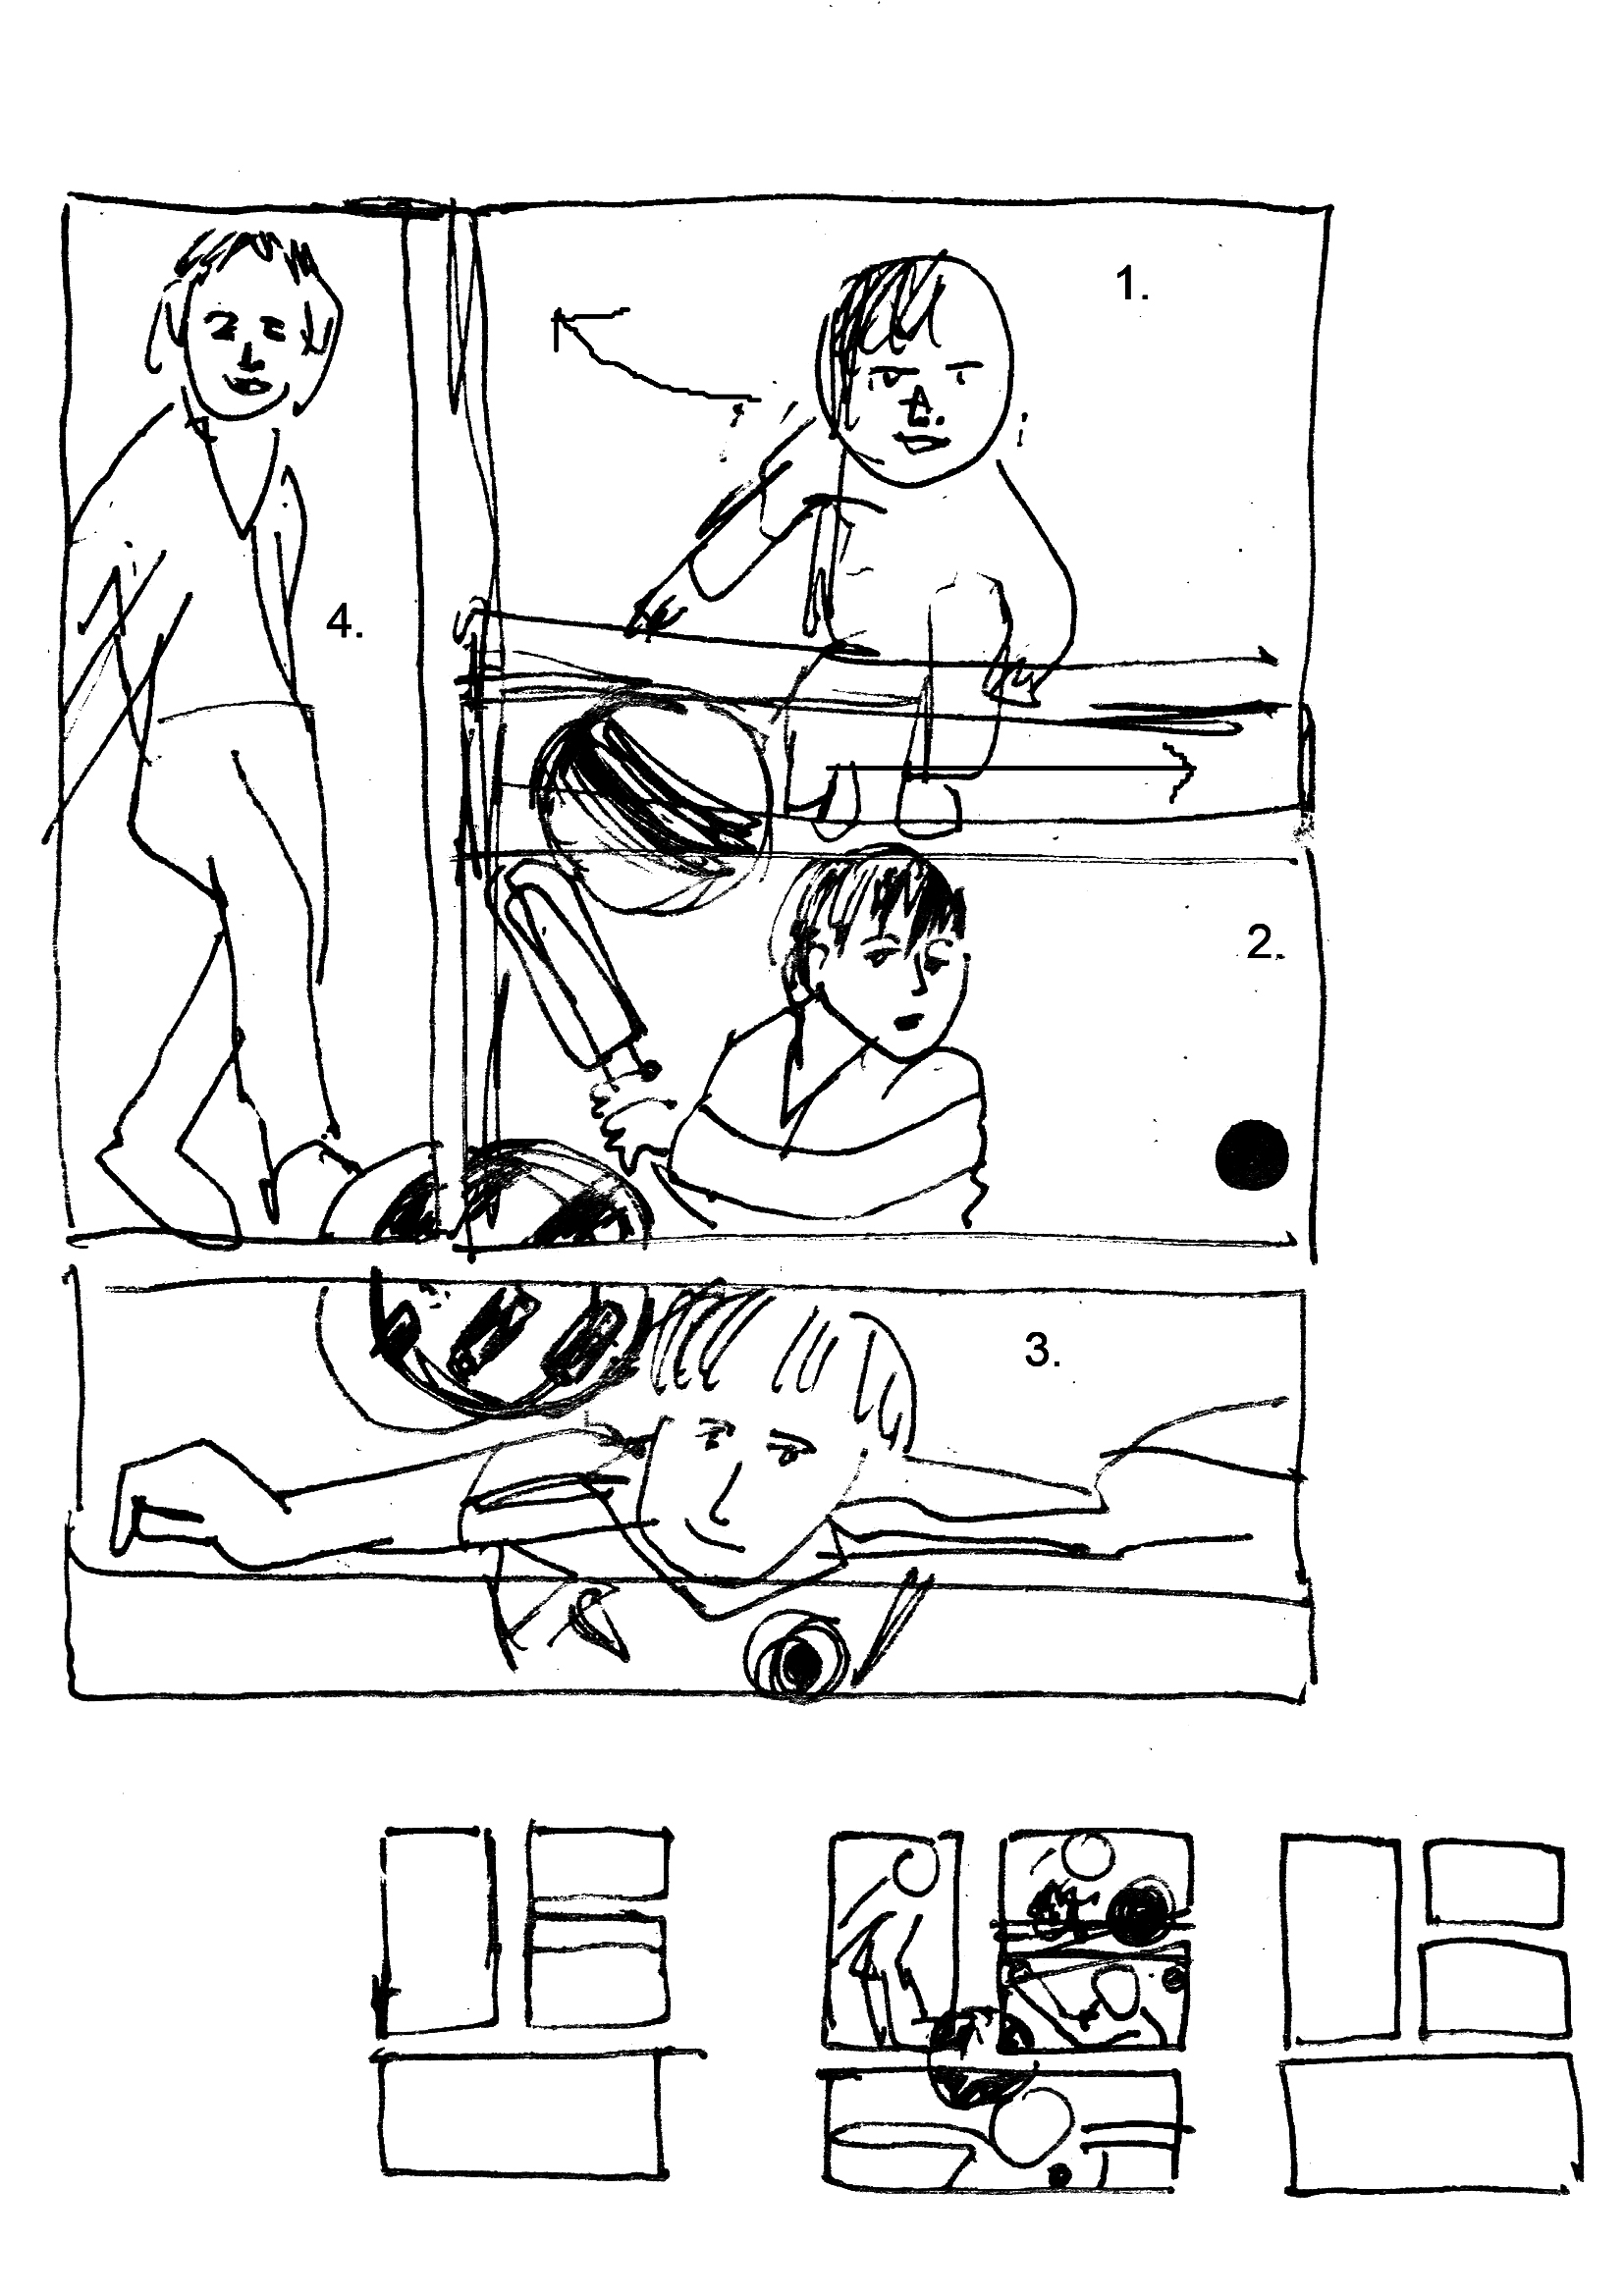 Fergunsons Process 5.jpg